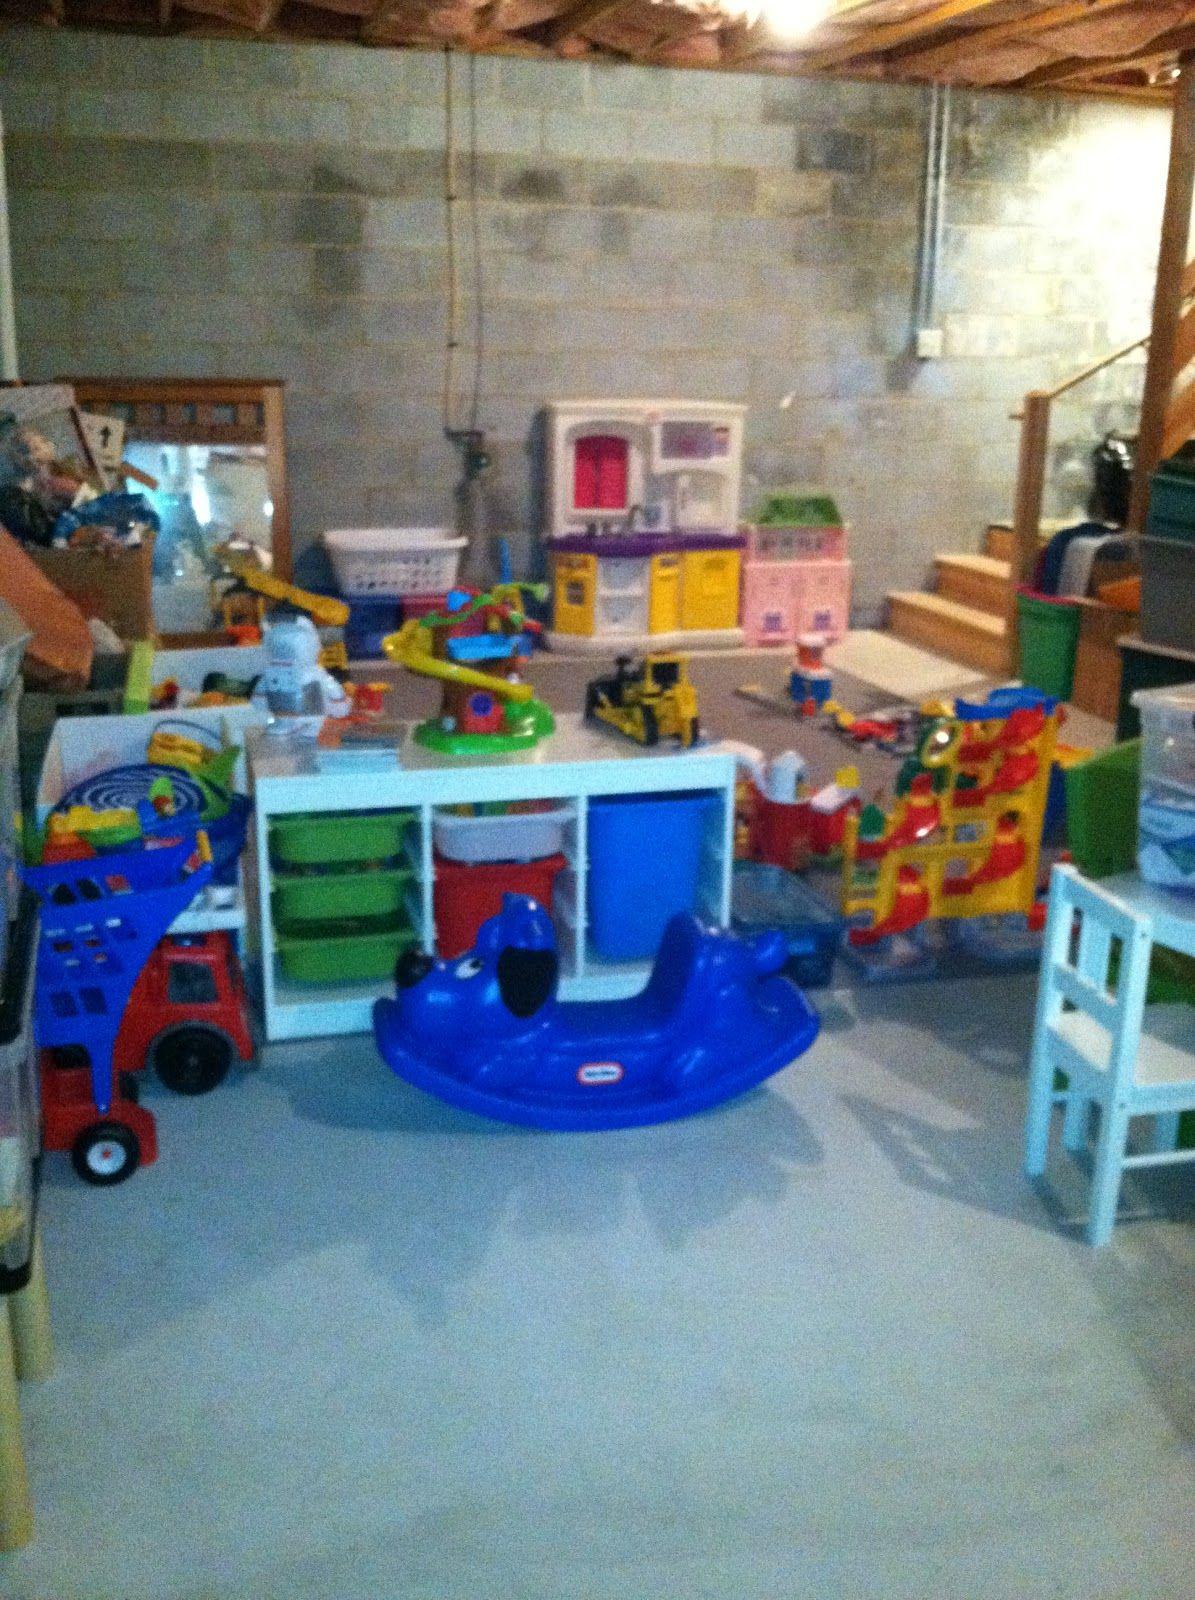 Rustic playroom that the kids LOVE